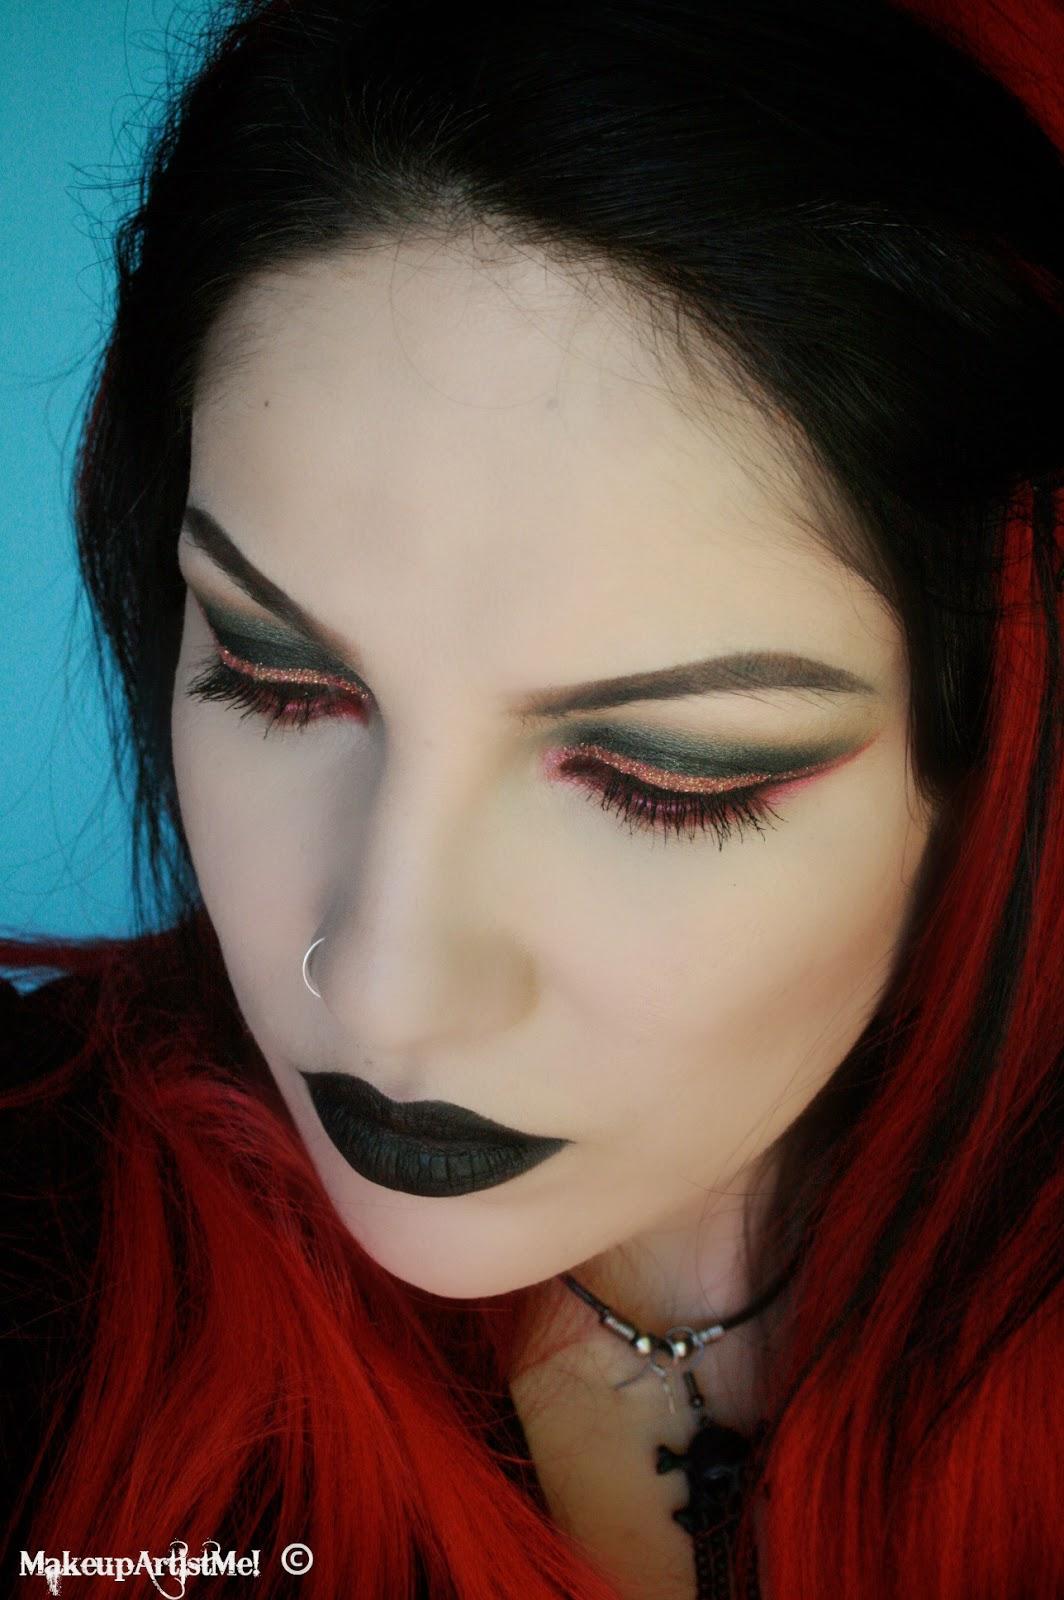 Makeup Artist Youtube: Make-up Artist Me!: My Goth! Makeup Tutorial